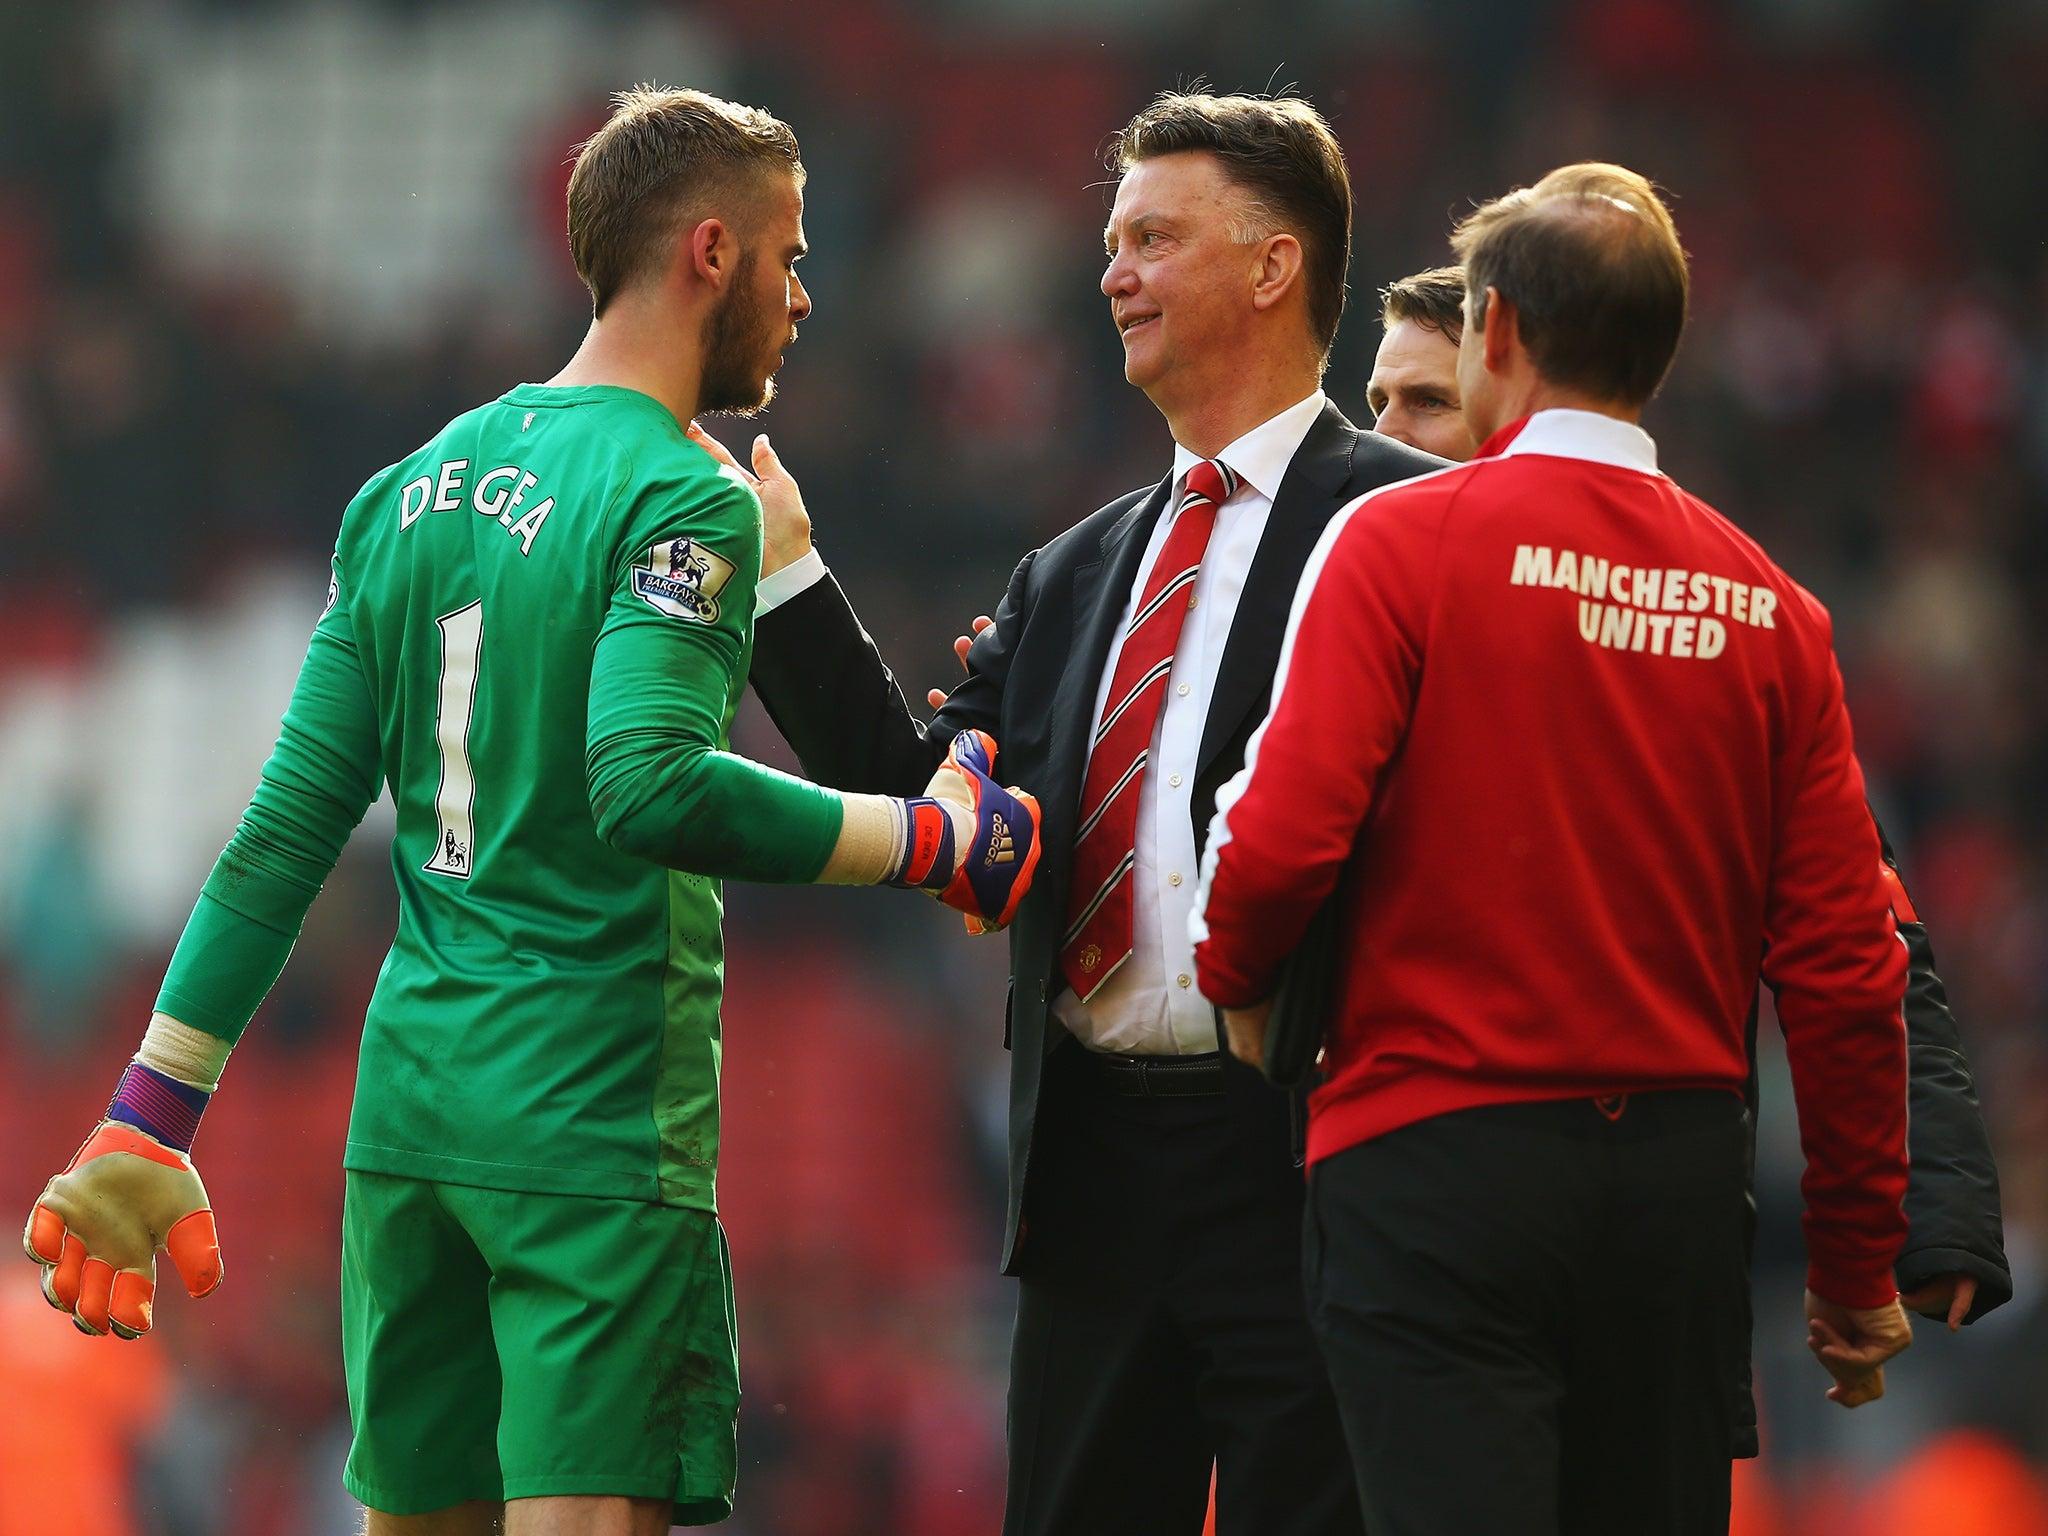 Louis Van Gaal: Manchester United Boss Reveals That Being